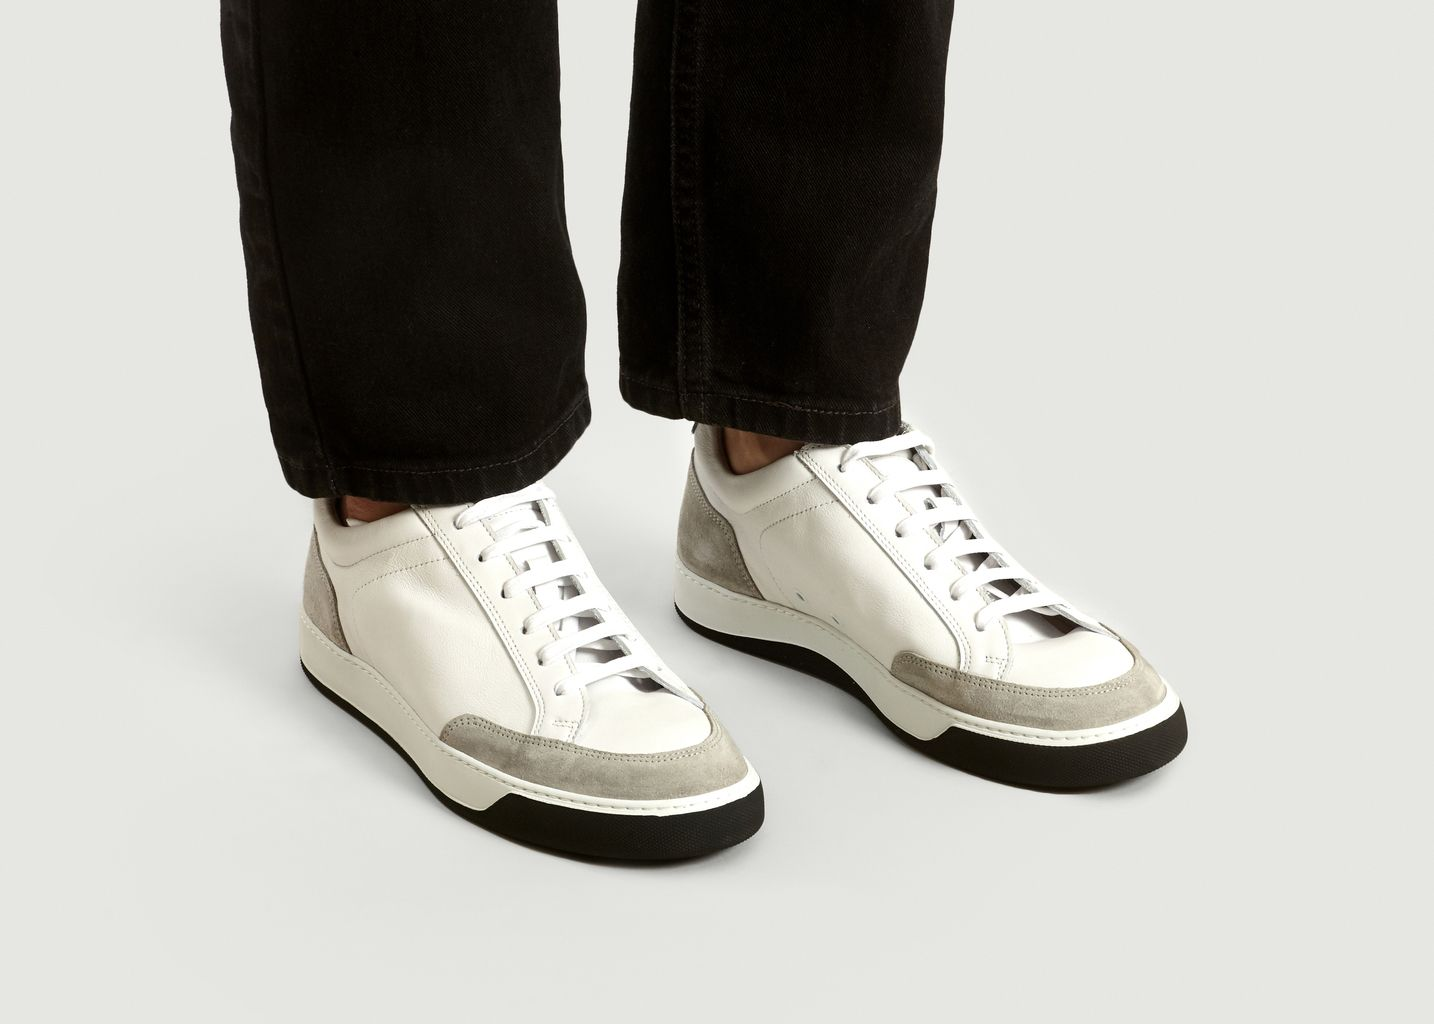 Sneakers Edition 6 Bi-Matière - National Standard